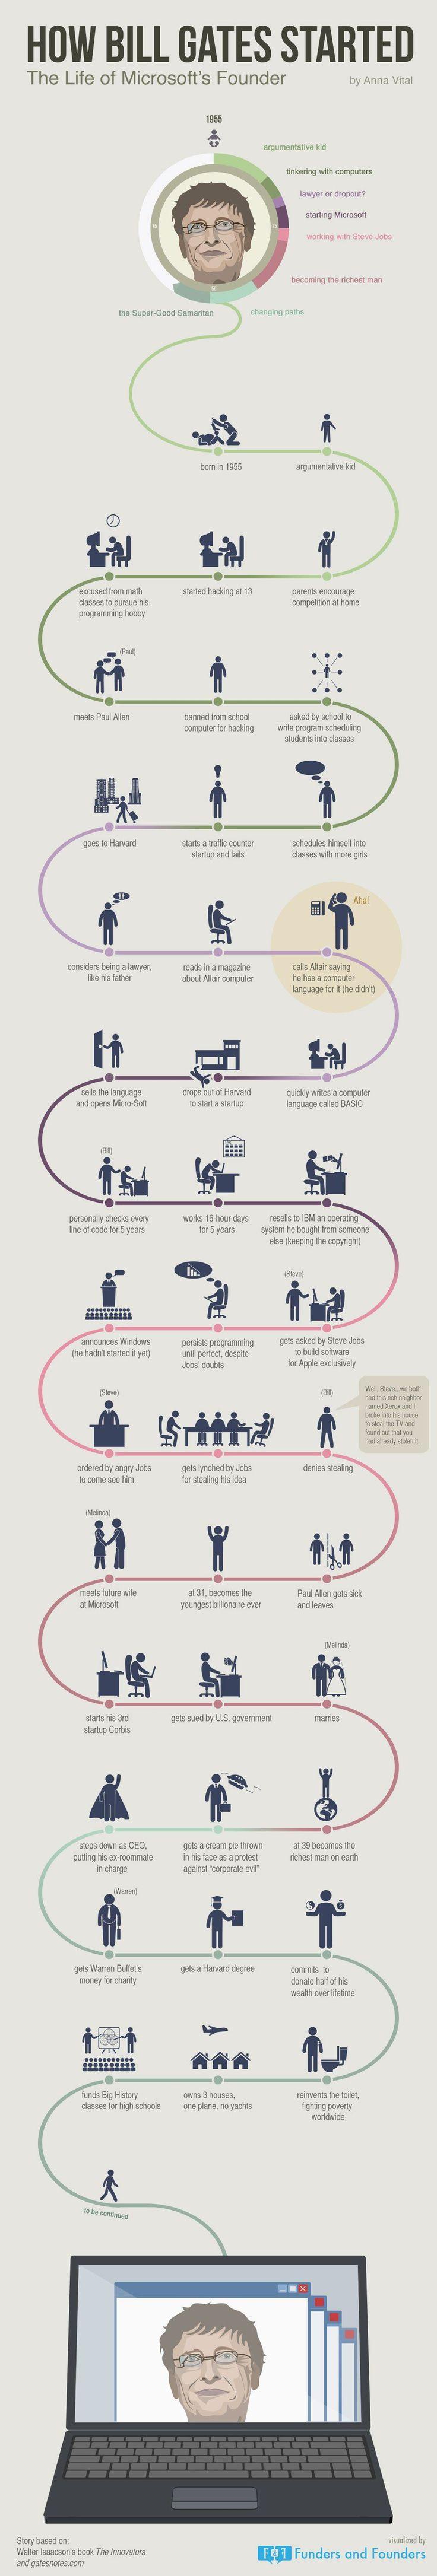 How Bill Gates Started: The Life of Microsoft's Founder #infographic #infographics #BillGates #Microsoft #entrepreneur #entrepreneurship